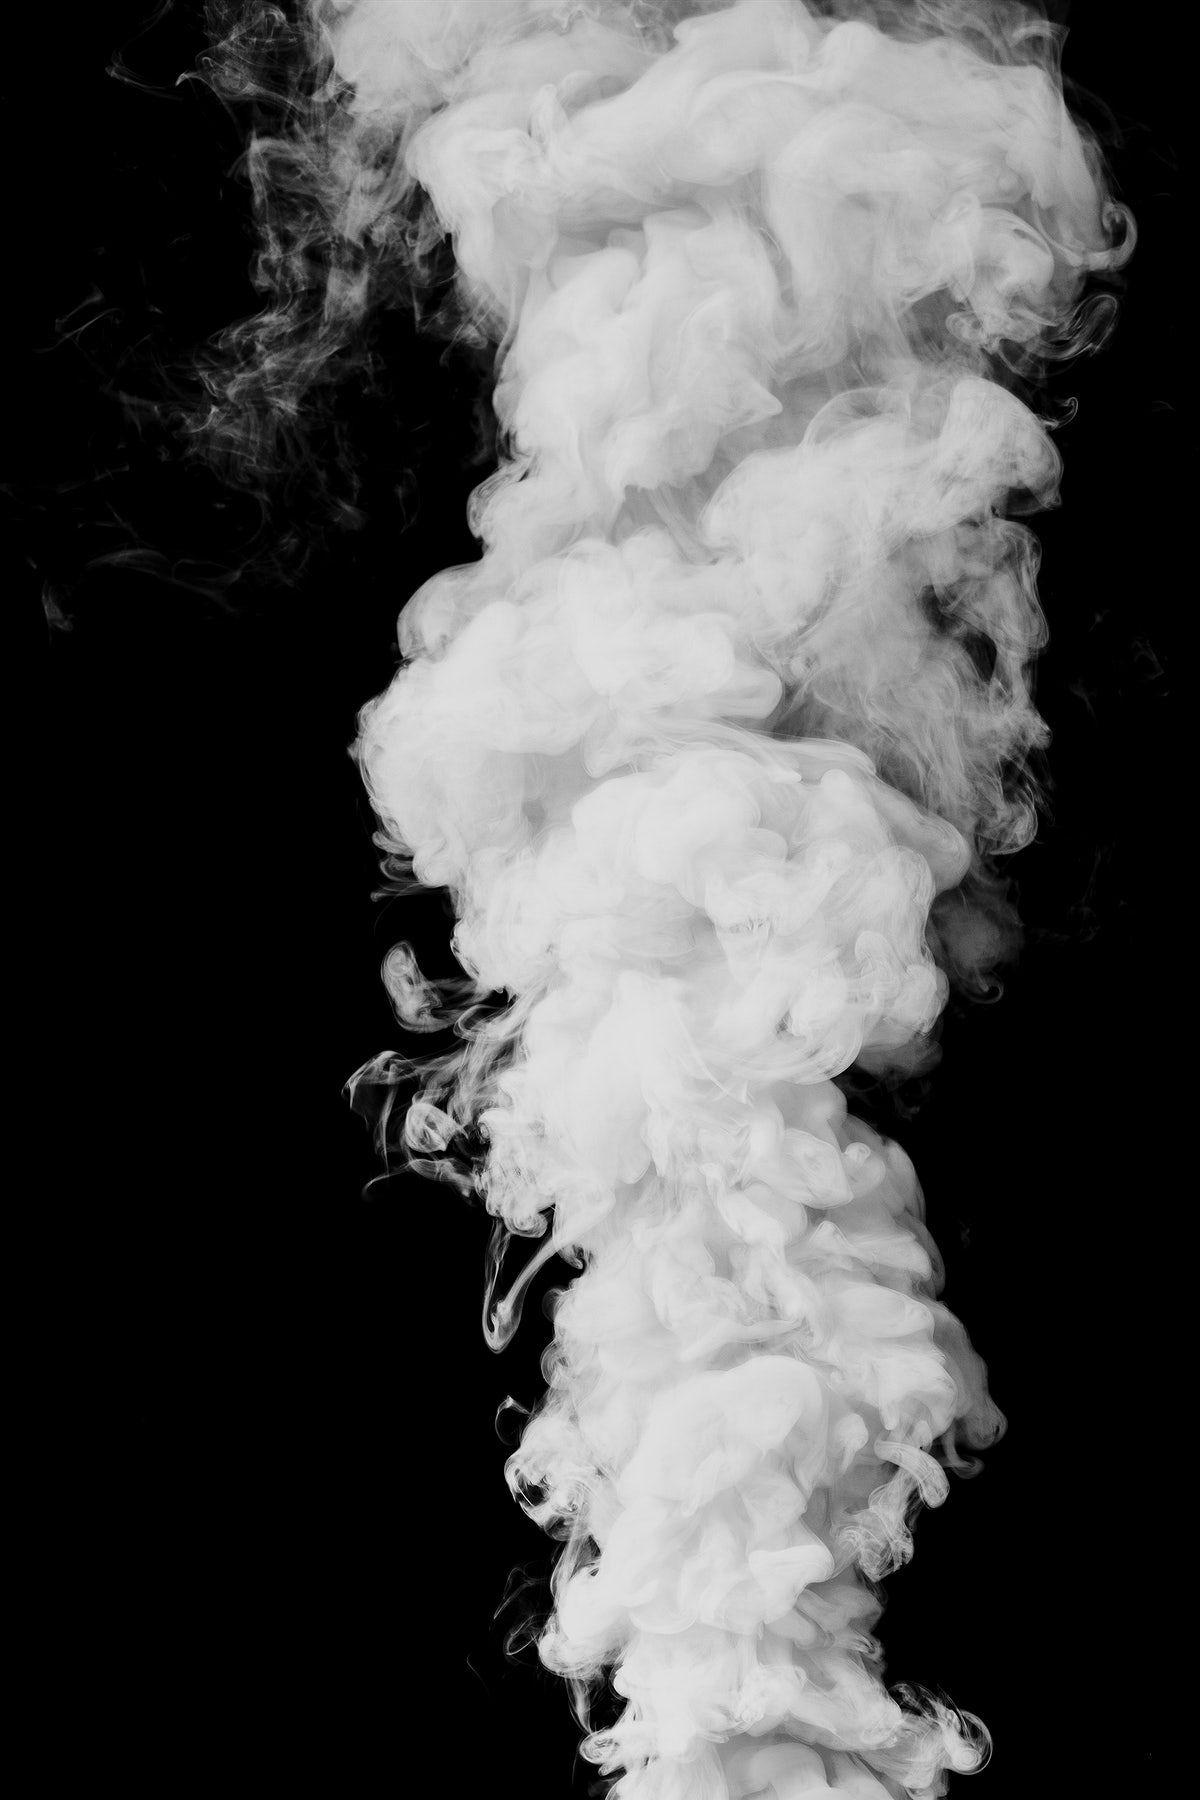 Download Premium Illustration Of White Smoke Effect Design Element On A Black And White Background Smoke Wallpaper Smoke Vector